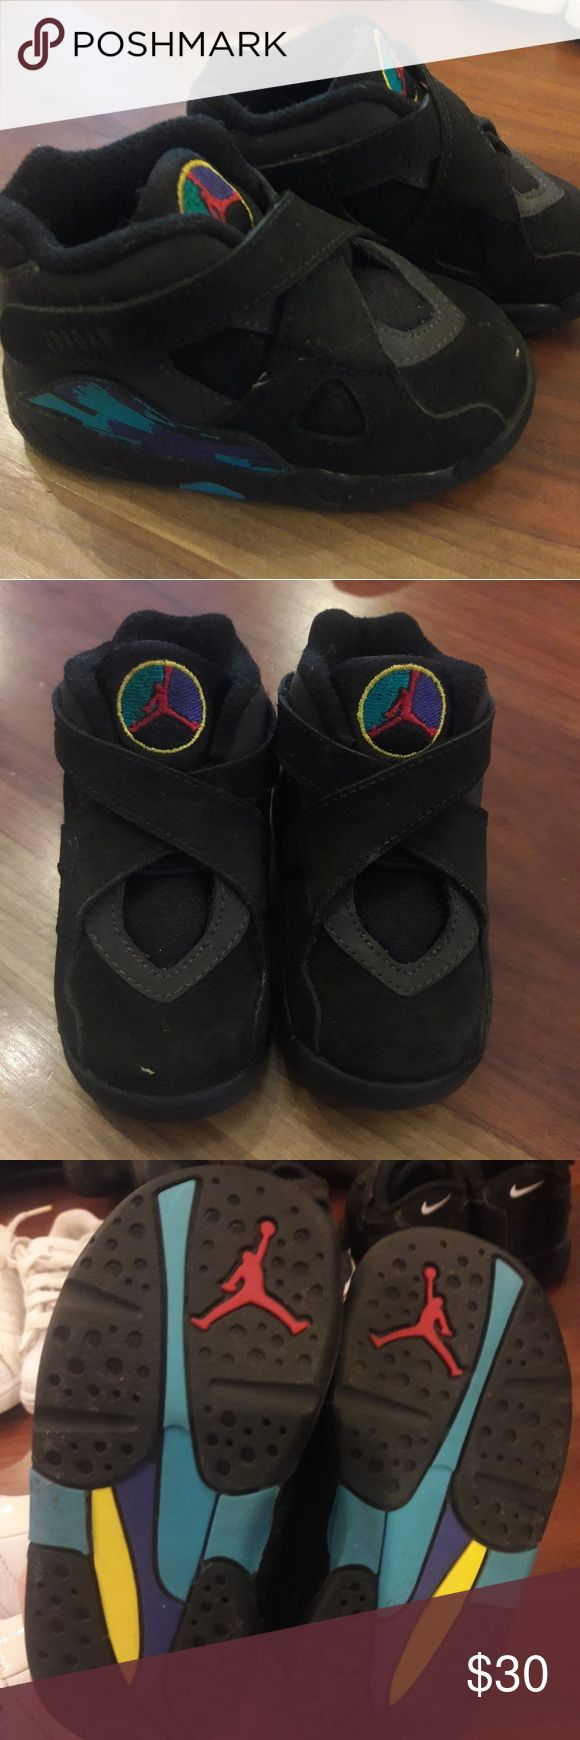 Toddler baby sz 5 Jordan 8 aqua shoes, LIKE NEW So cute Jordan Shoes Sneakers